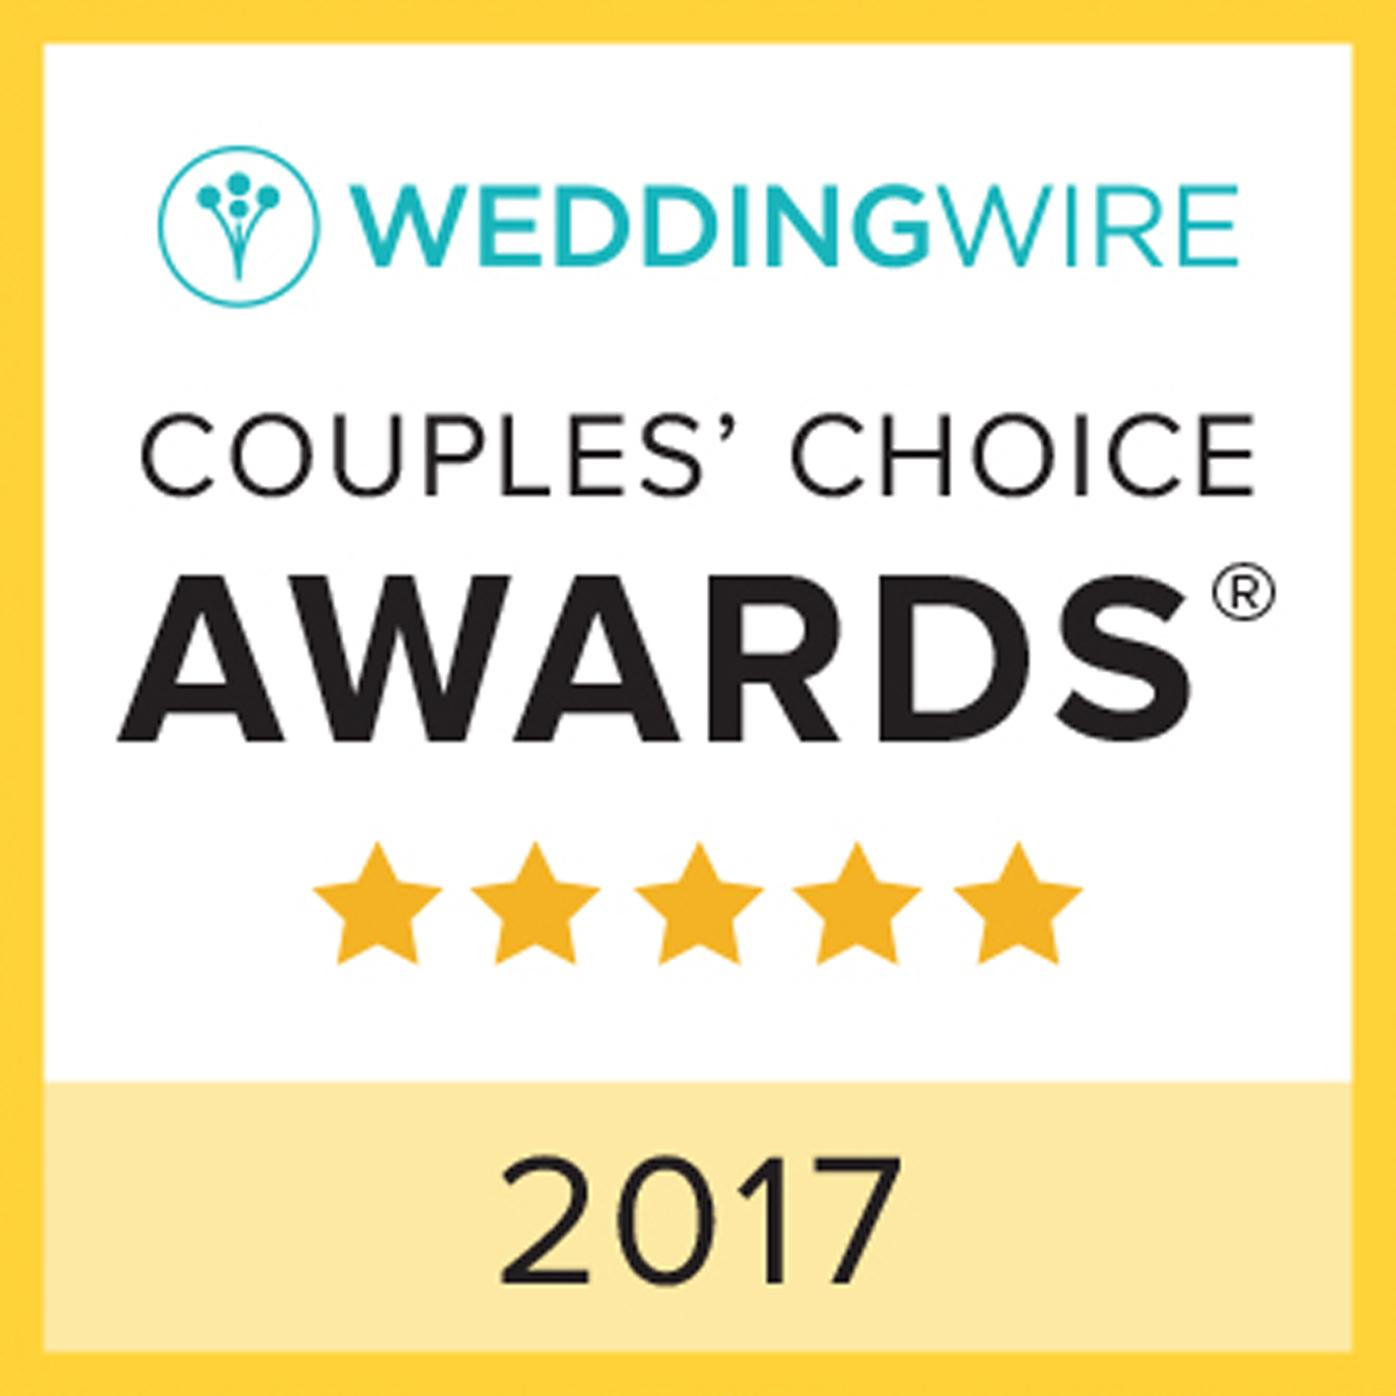 Couples Choice Awared_2017.jpg